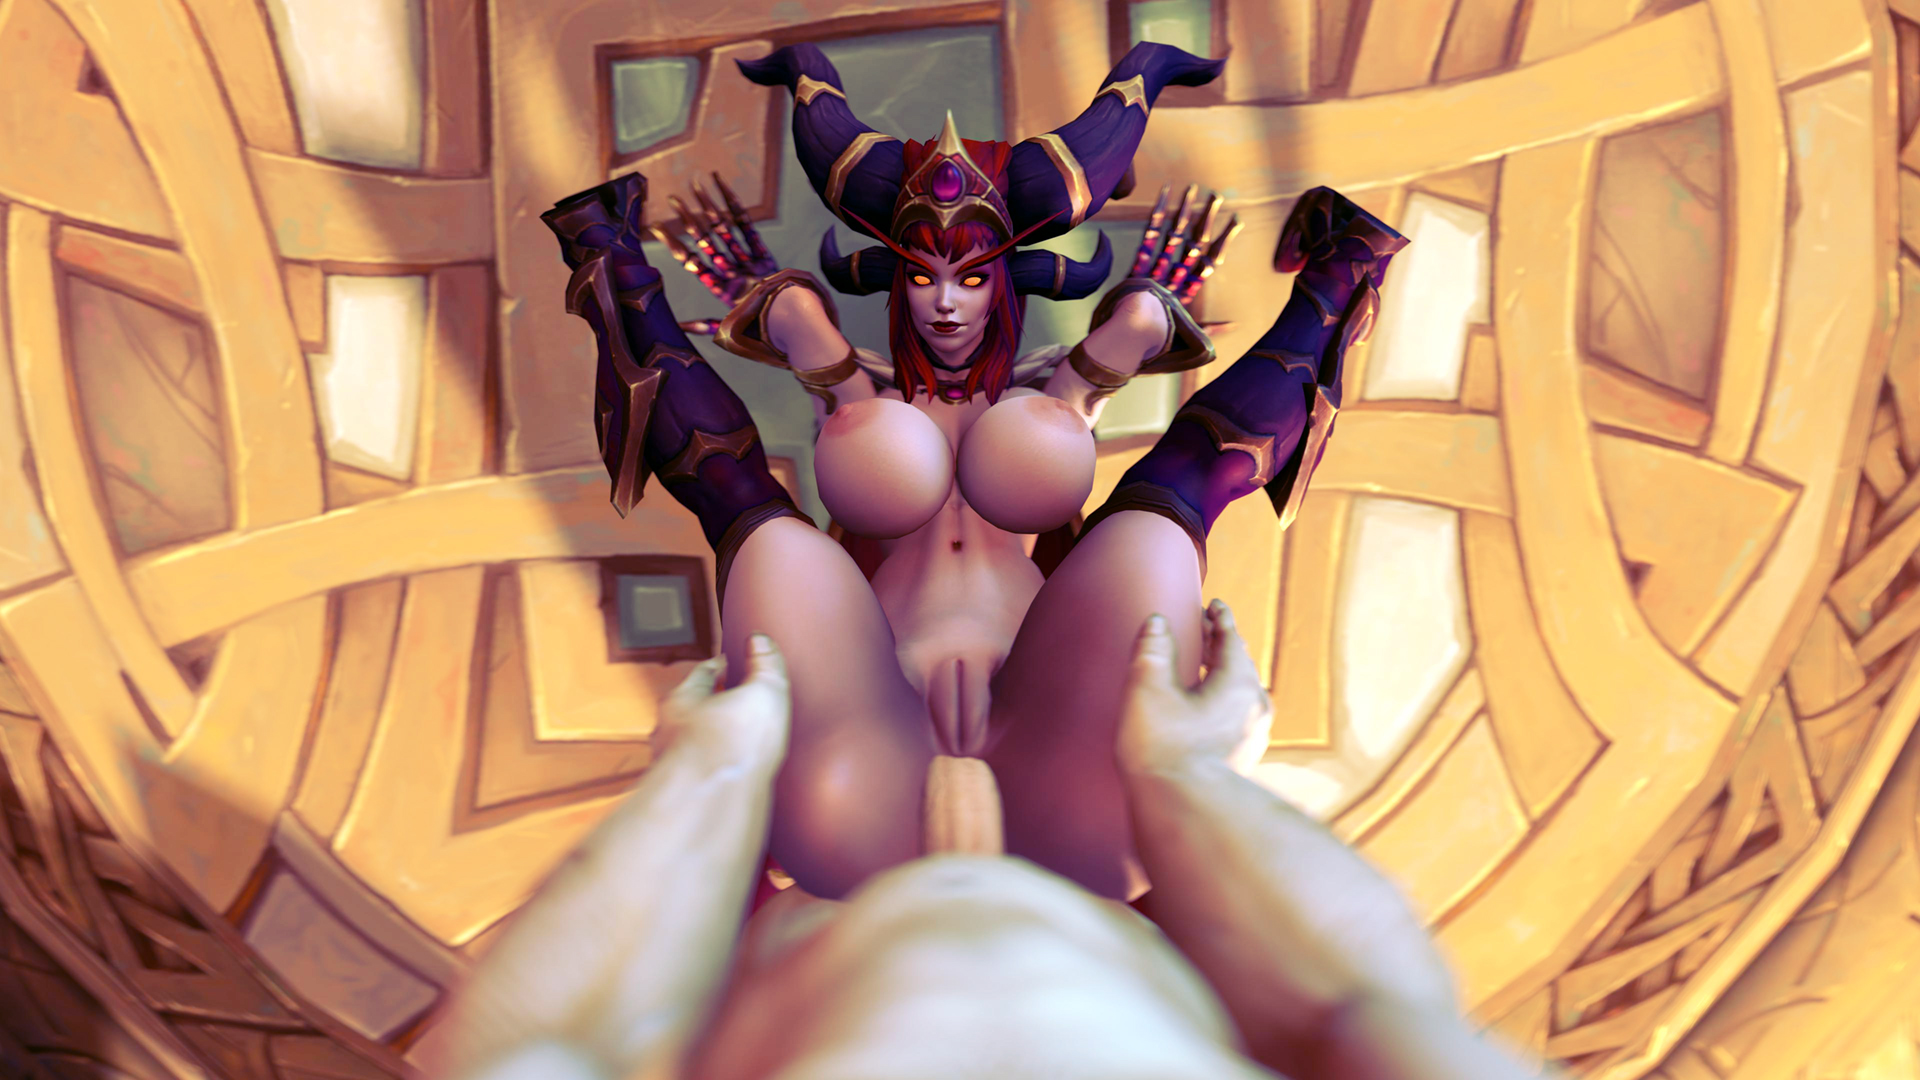 Joanne Guest erotic video